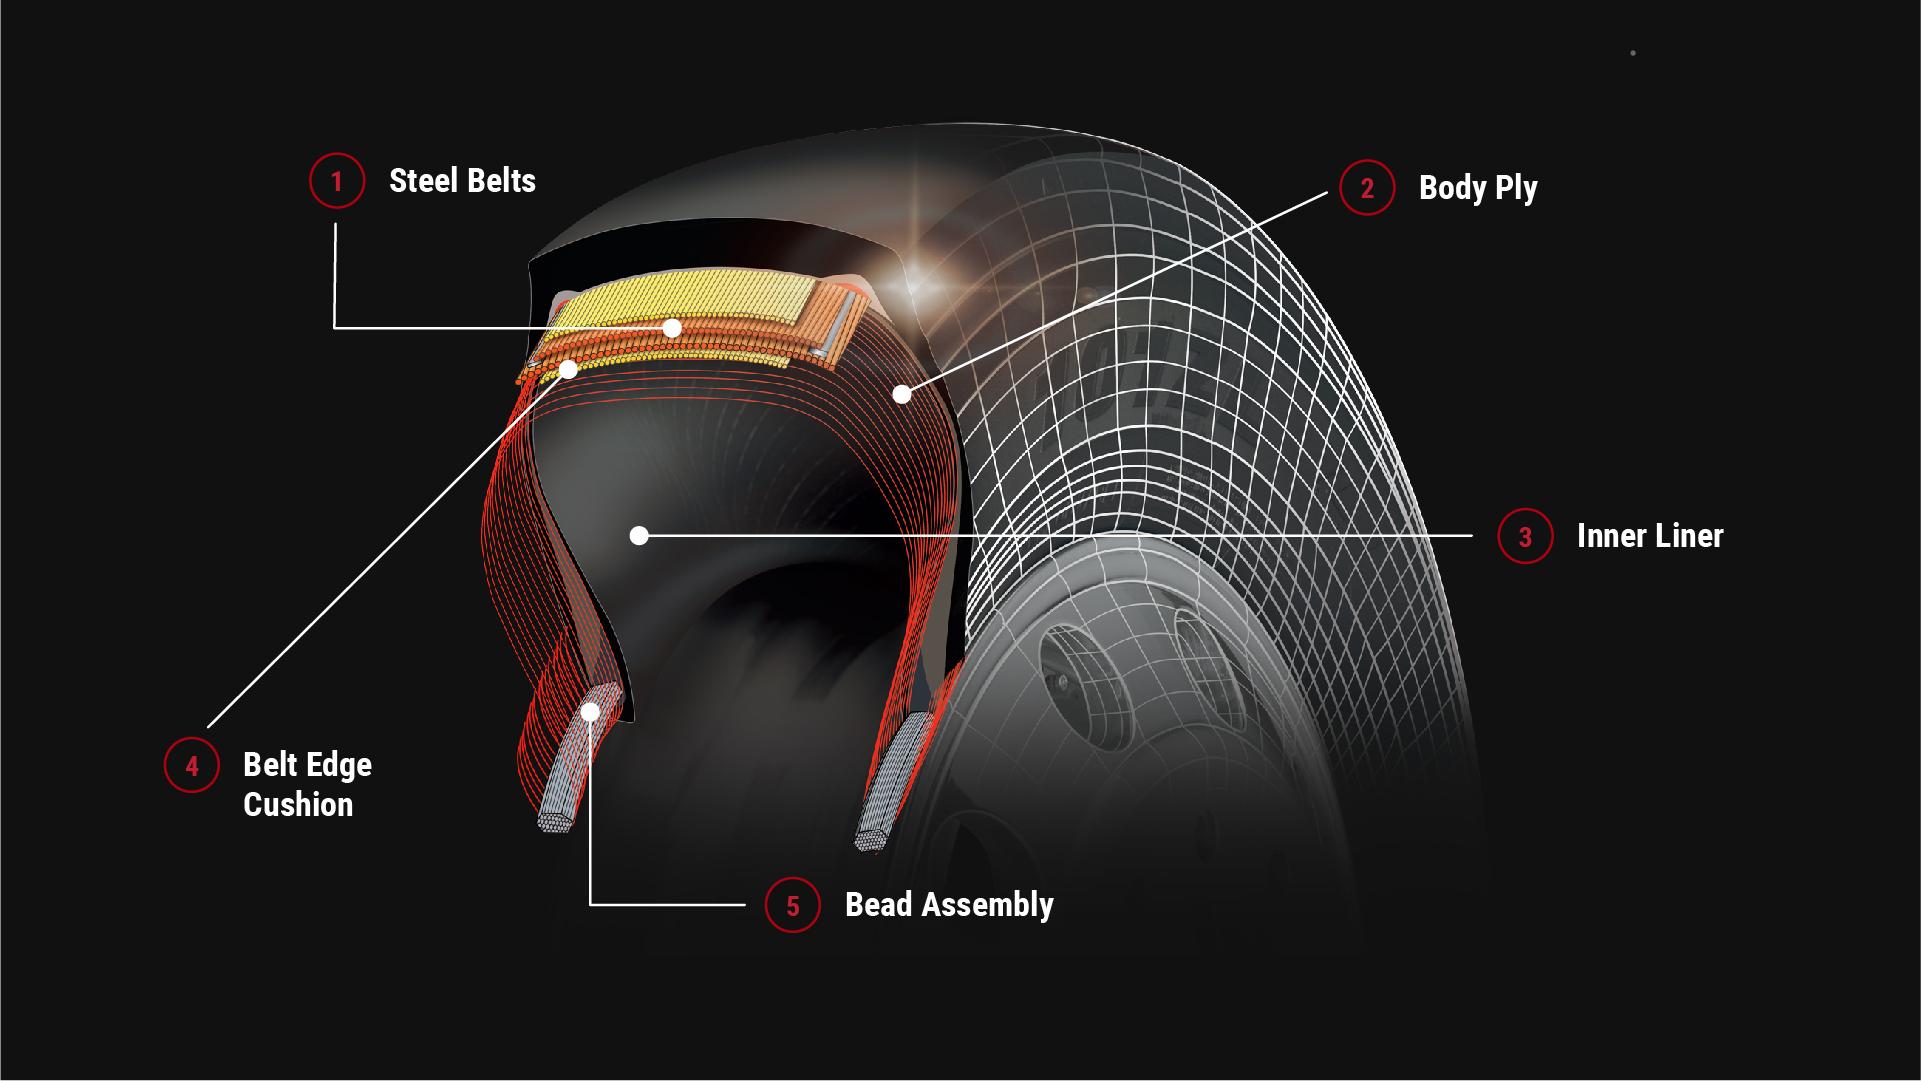 Bead Assembly